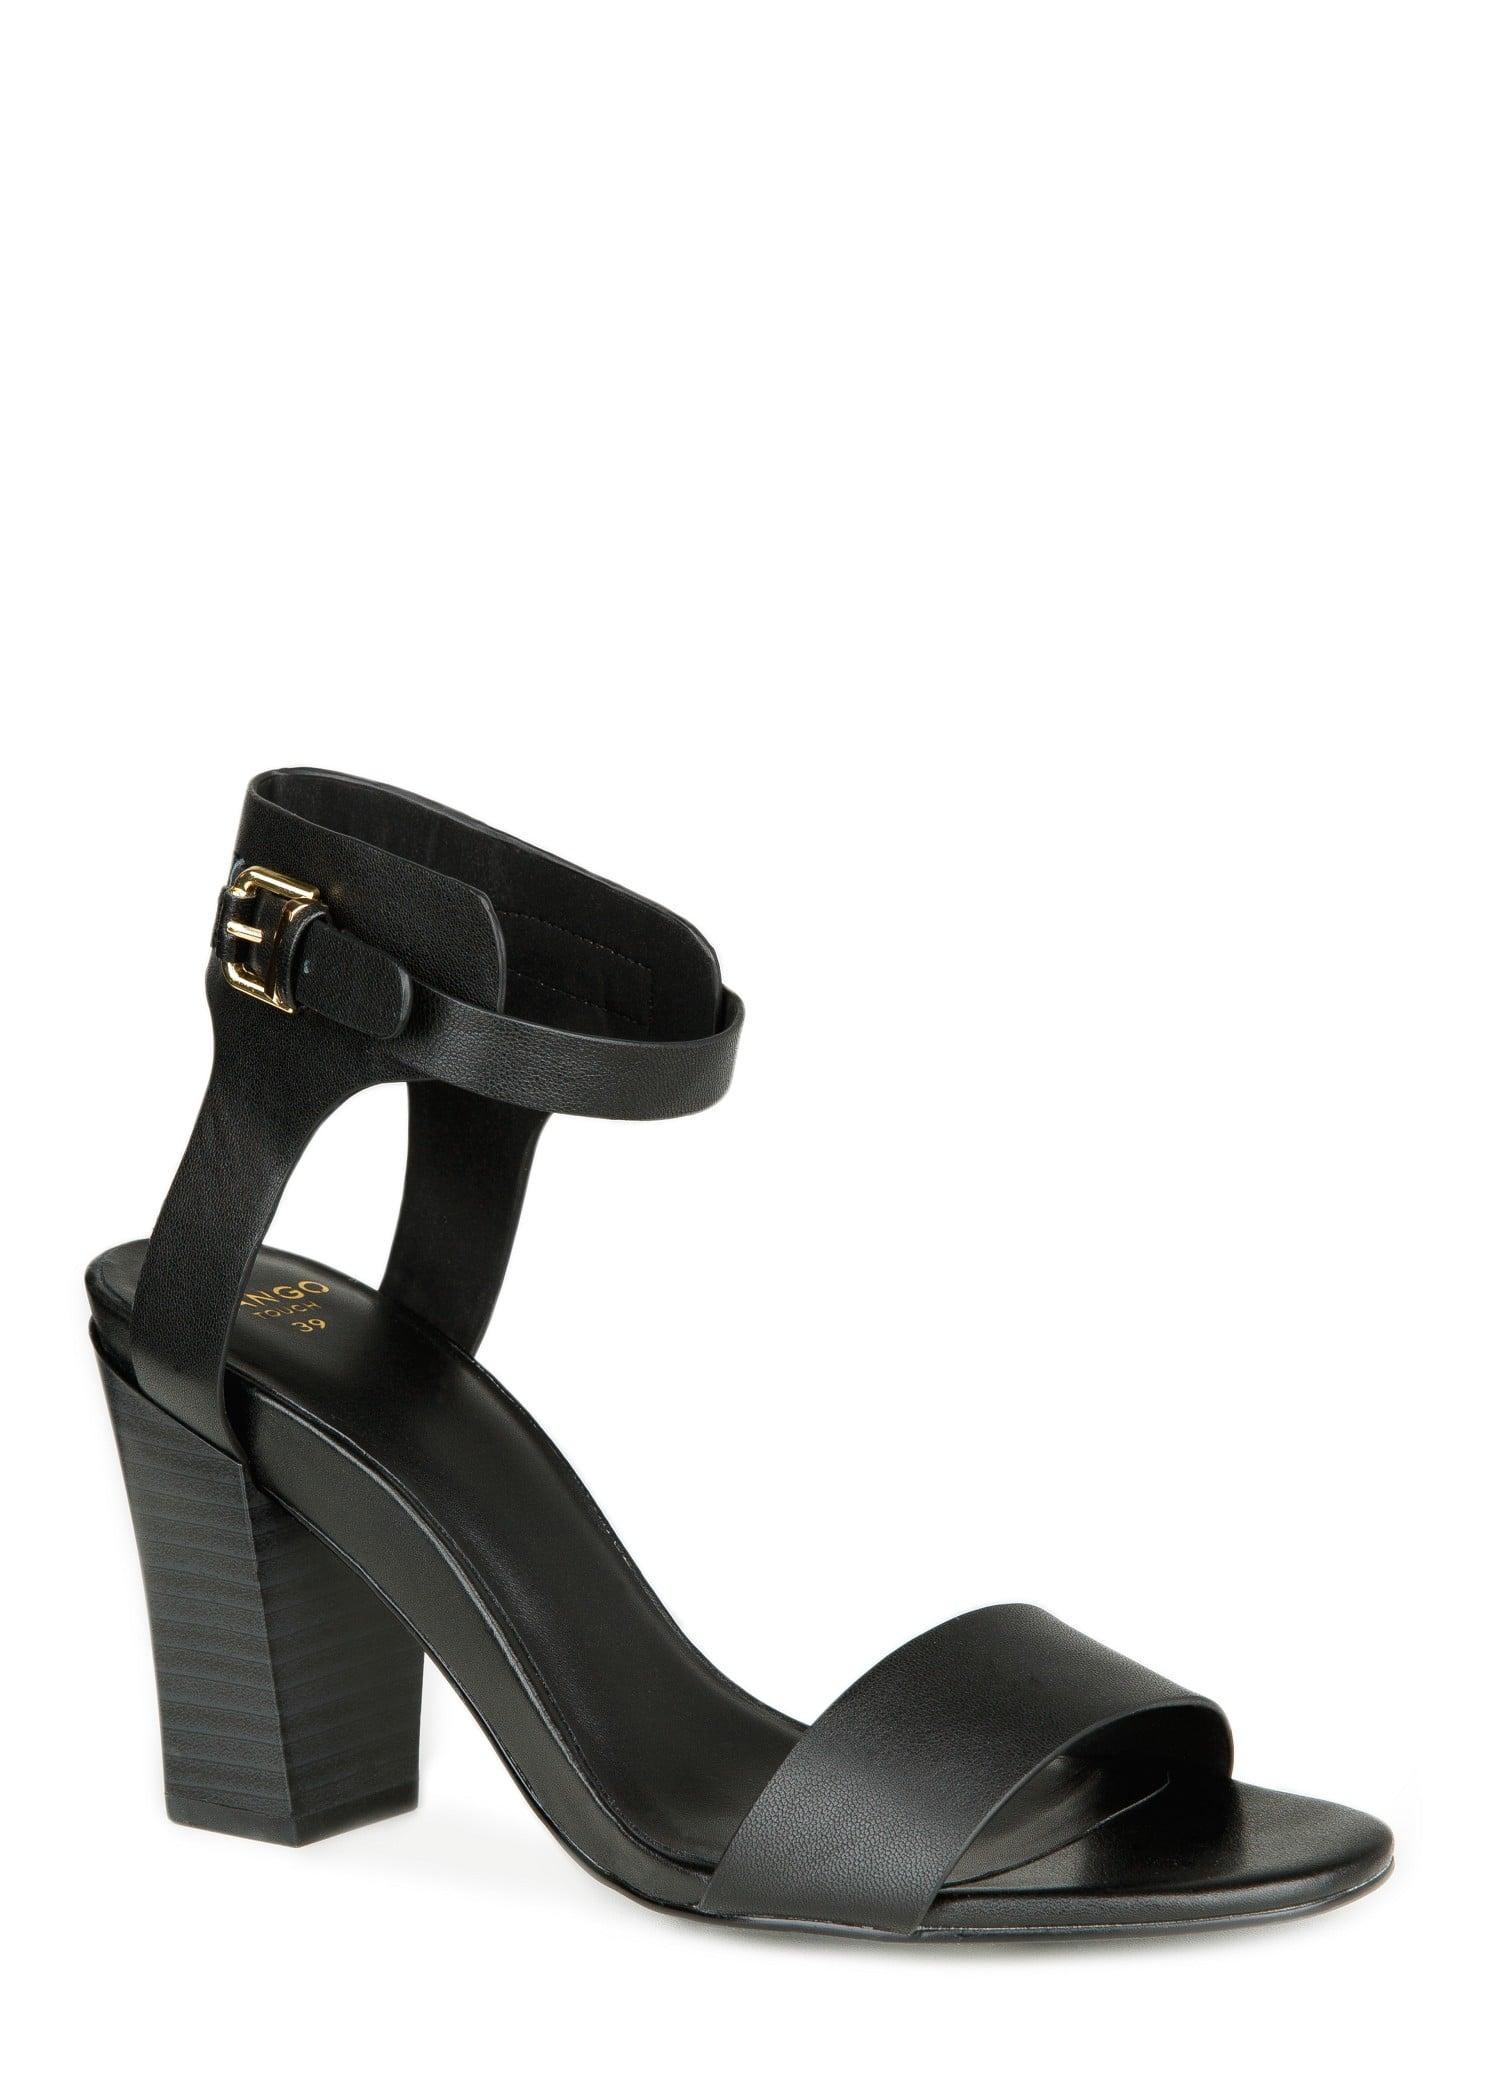 Mango Black Ankle-Strap Sandals